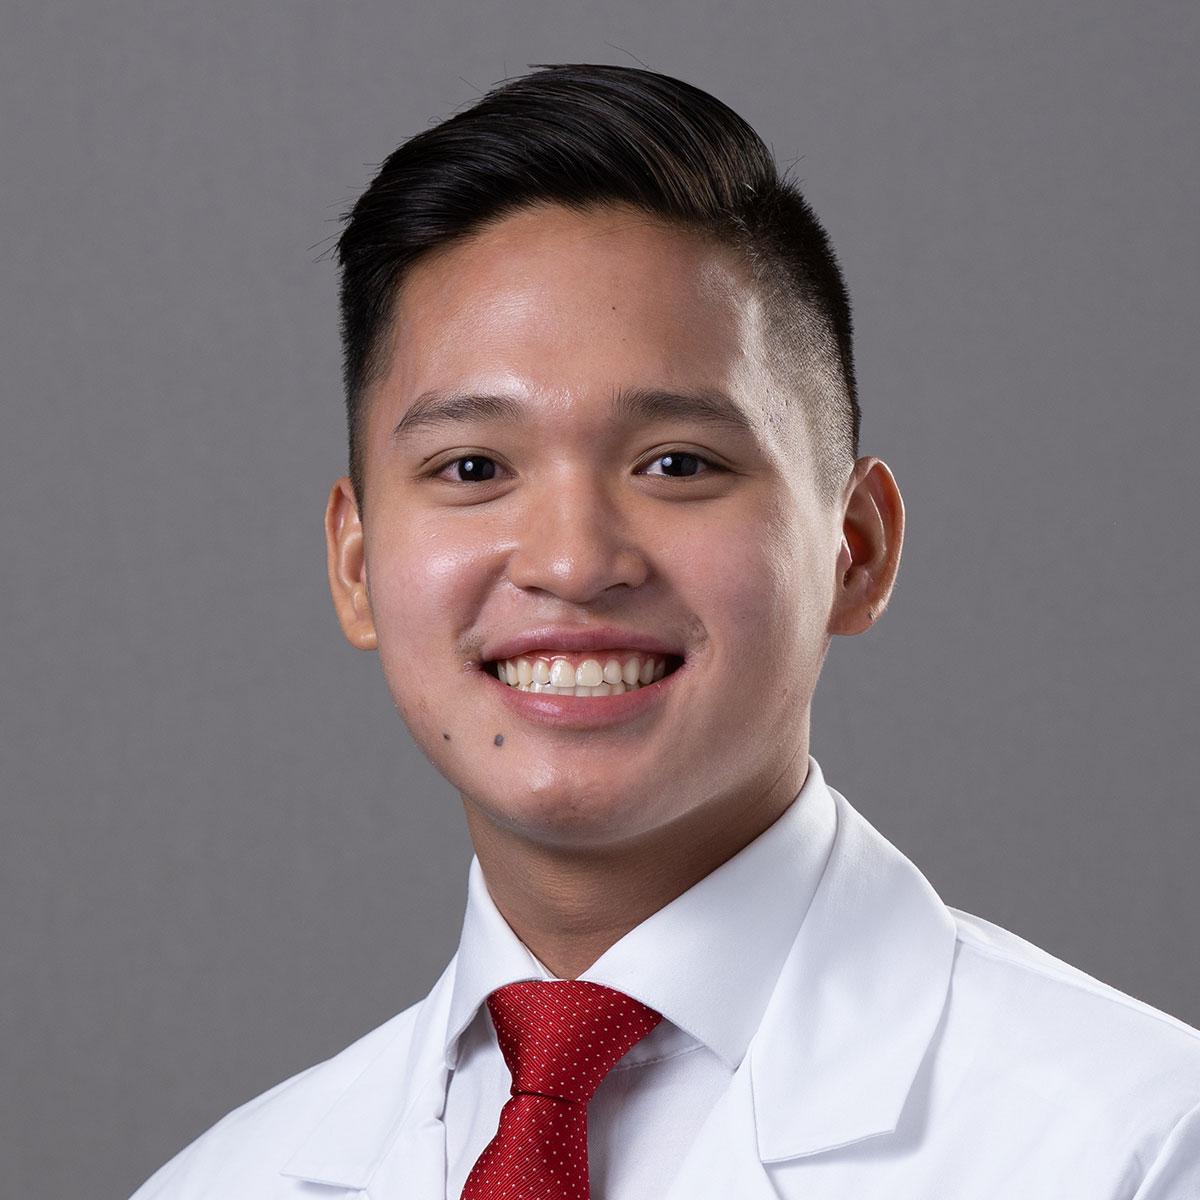 A friendly headshot of Dr. Louis Mercado